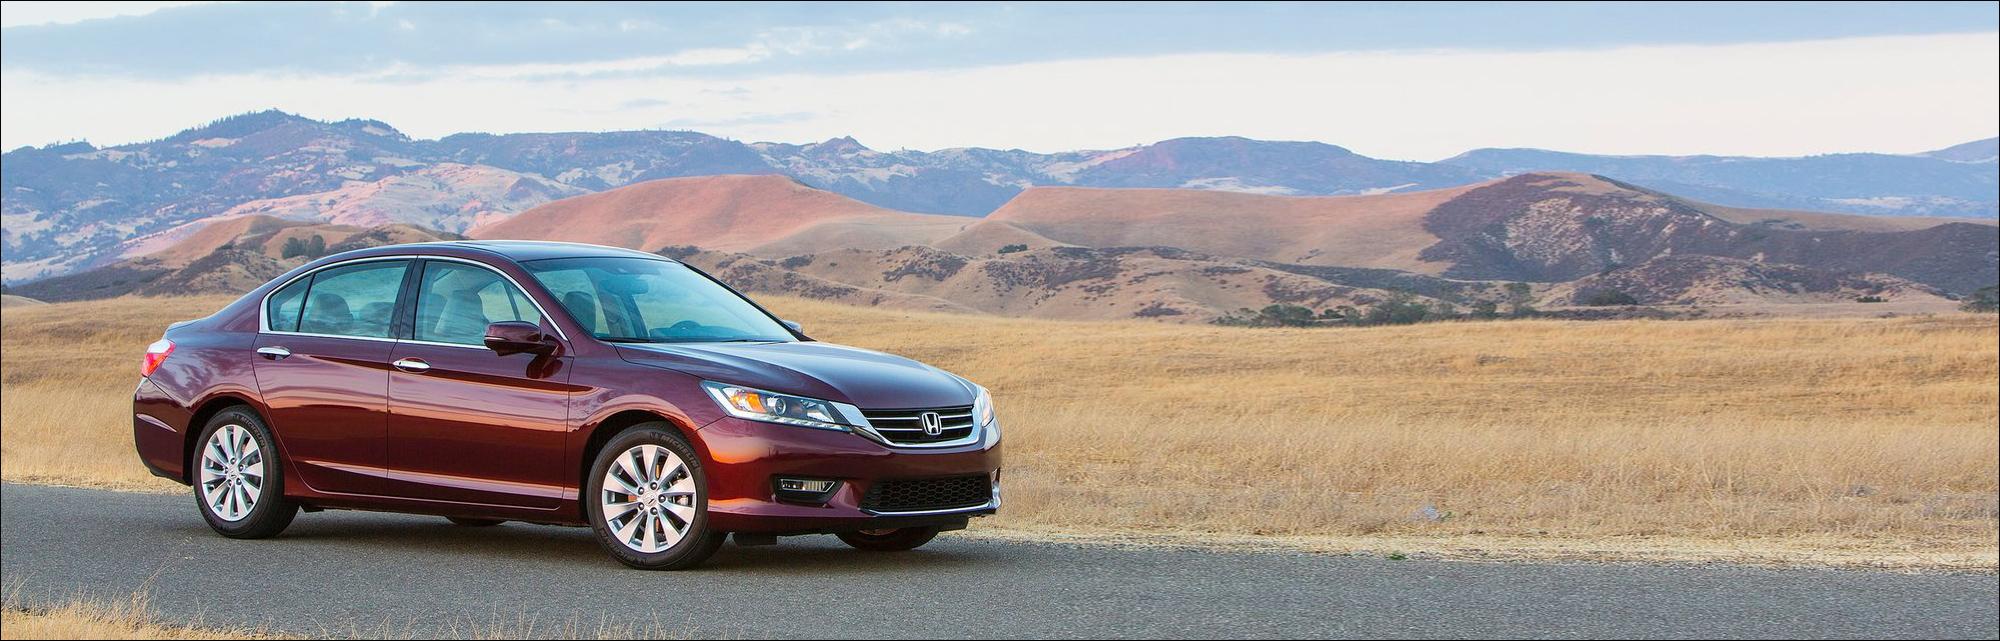 Town Auto Sales Inc Used Cars Waterbury Ct Dealer